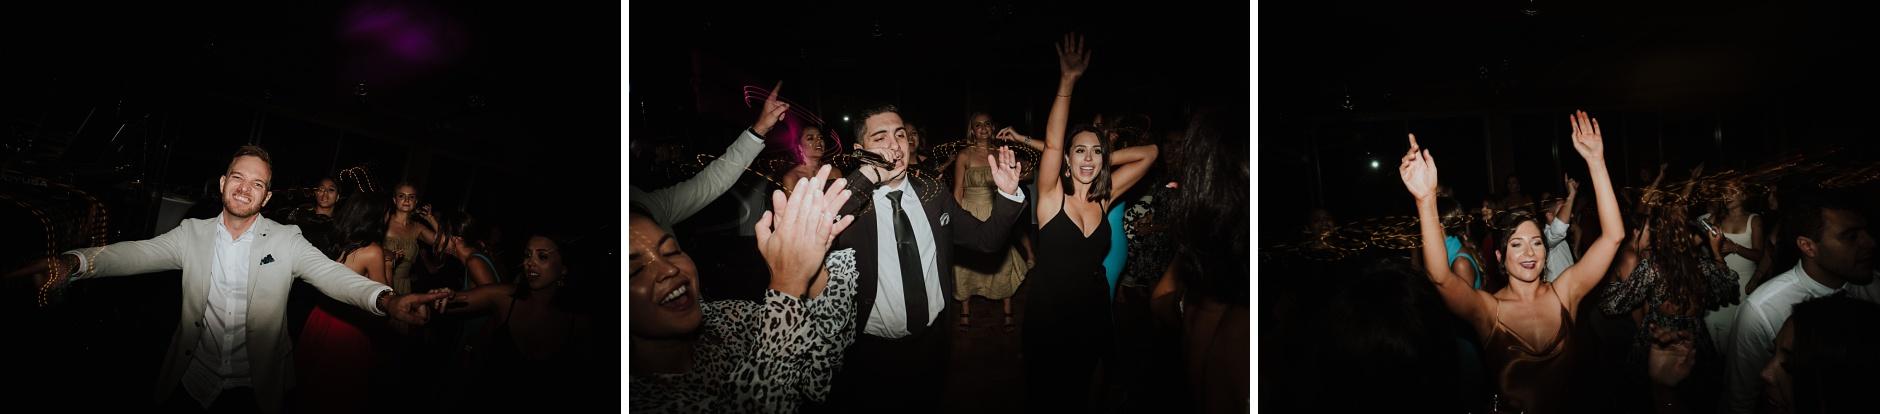 Sydney-Wedding-Photographer_0179.jpg